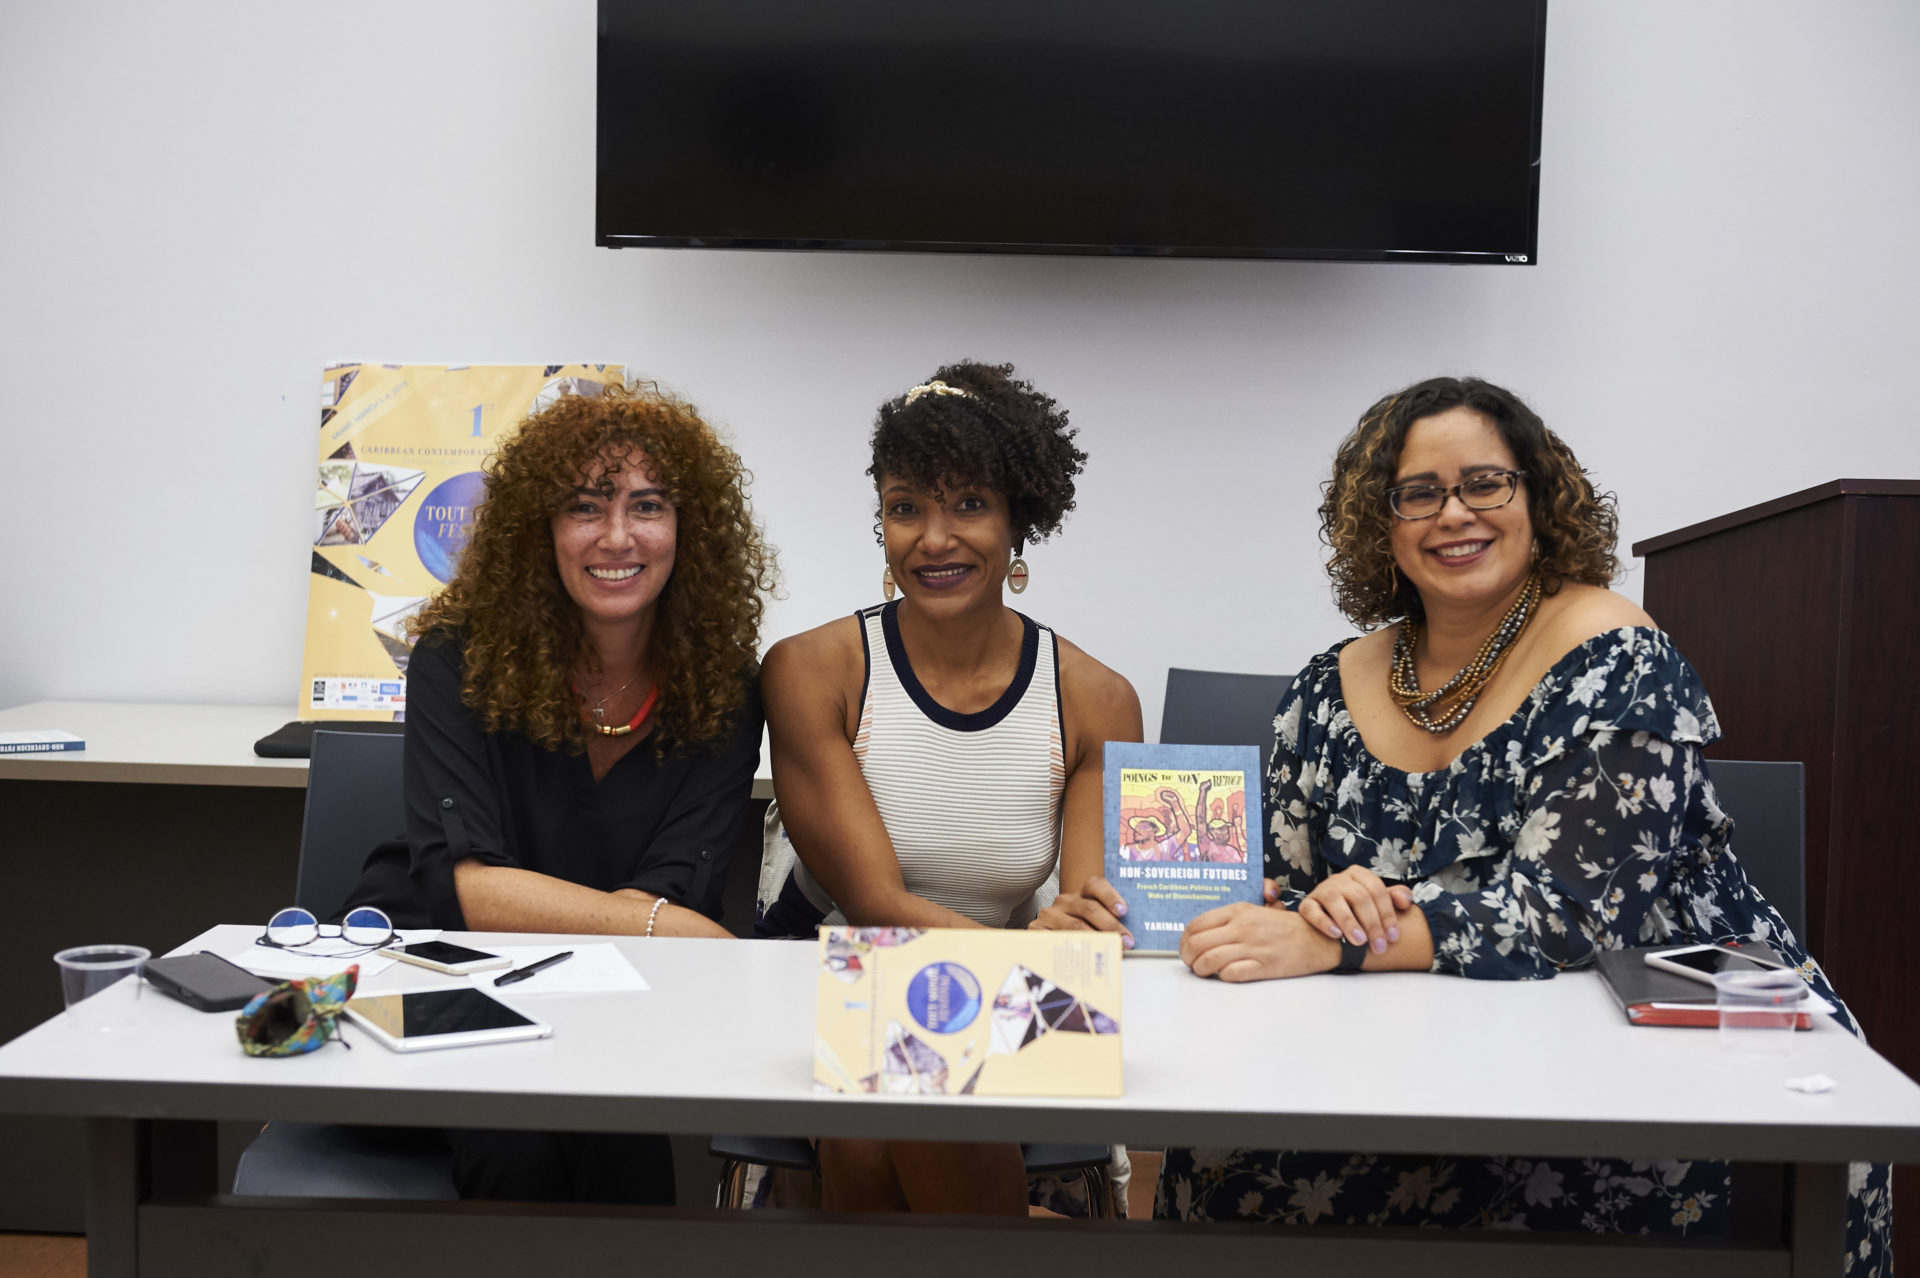 Johanna Auguiac, Claire Tancons, Yarimar Bonilla in conversation around her book Non-Sovereign Futures